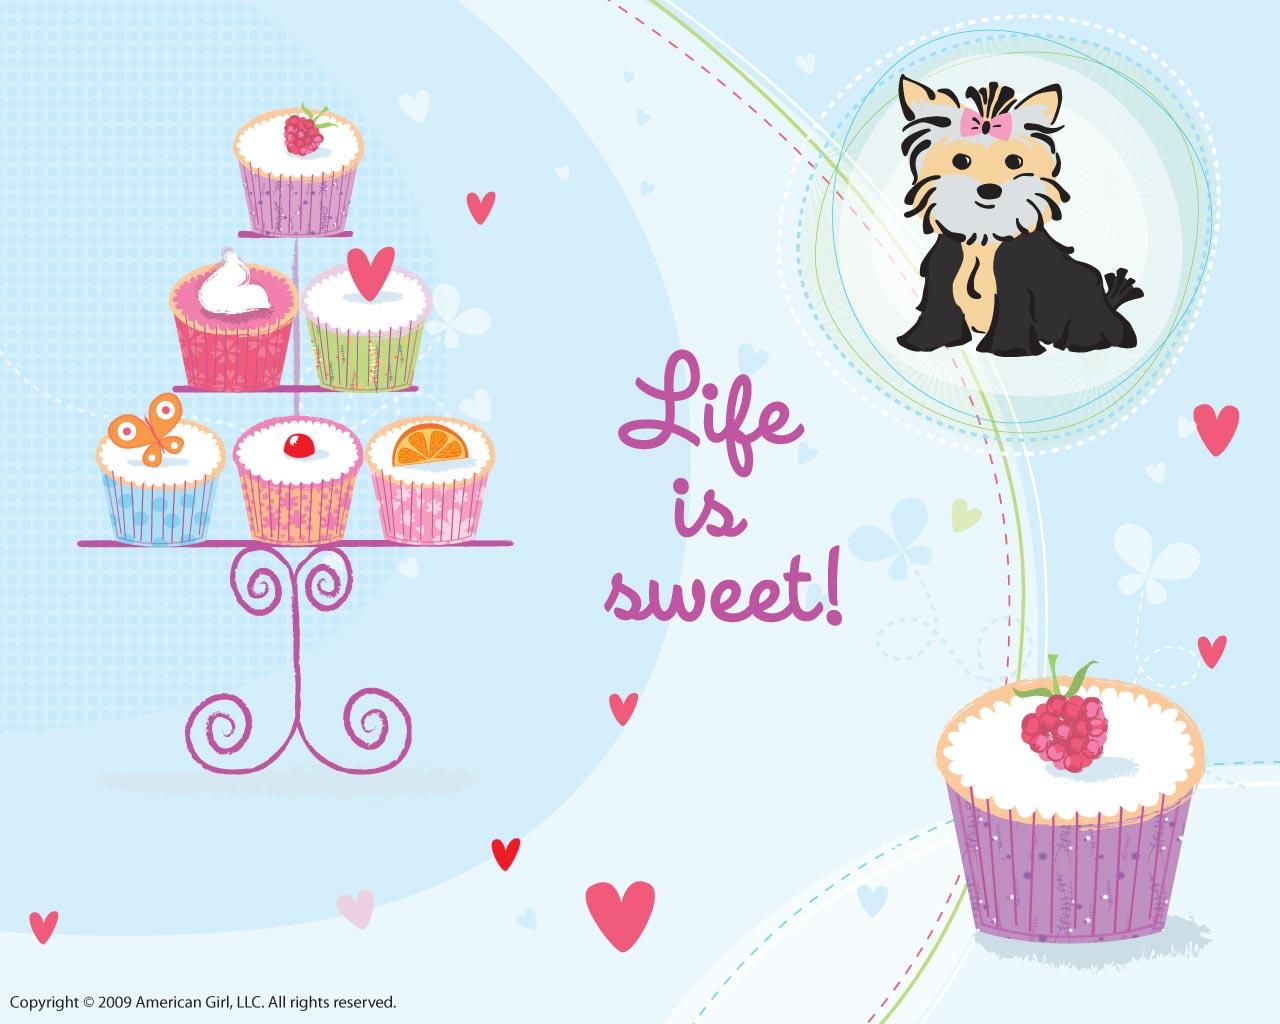 http://1.bp.blogspot.com/_xaIaSLcFMWs/TUxPVGpaDjI/AAAAAAAAJOw/3YGoKuE0eVw/s1600/SugarWallpaper_1280x1024.jpg